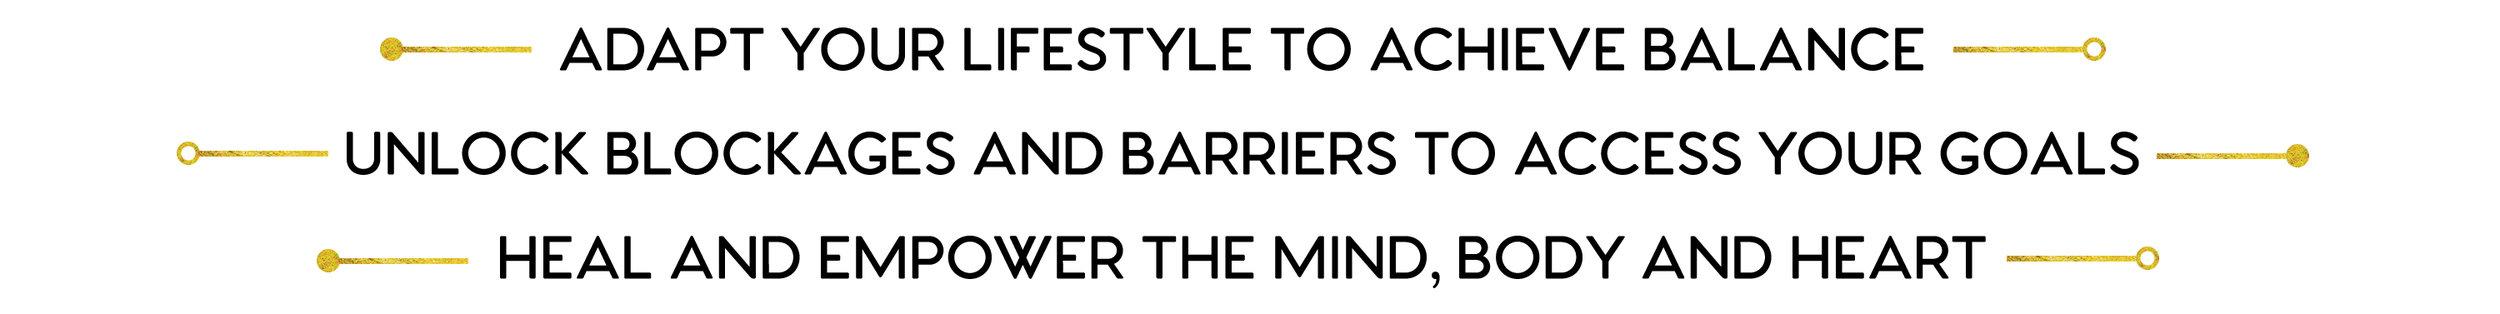 adapt your lifestyle to achieve balance